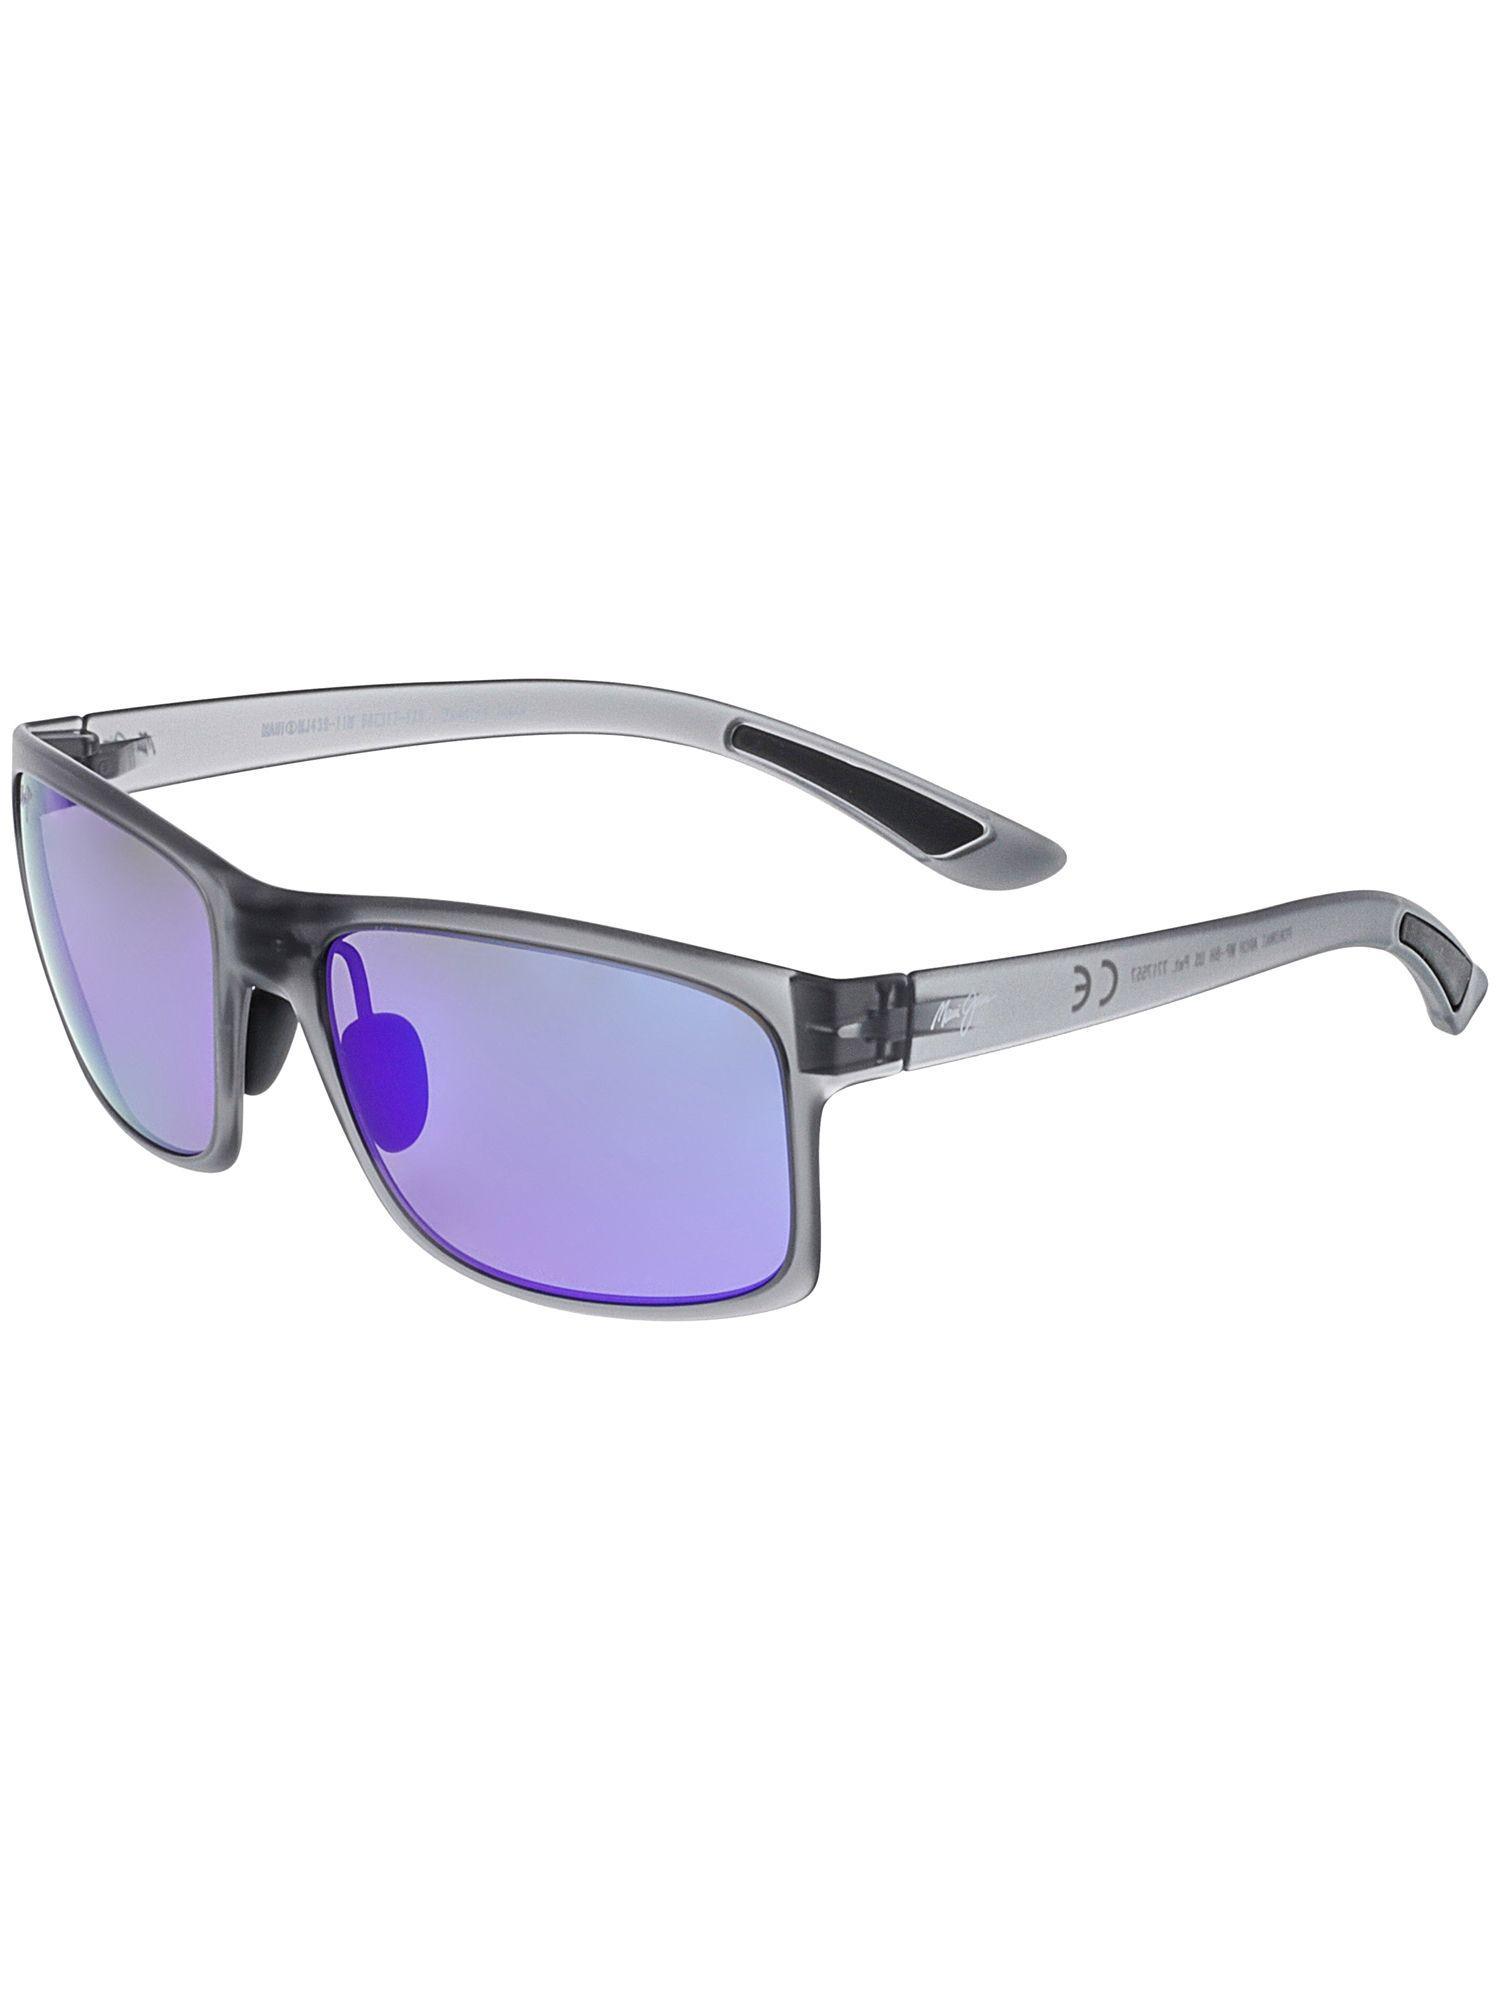 9e6bf901f6 Maui Jim. Gray Men s Polarized Pokowai Arch B439-11m Grey Rectangle  Sunglasses